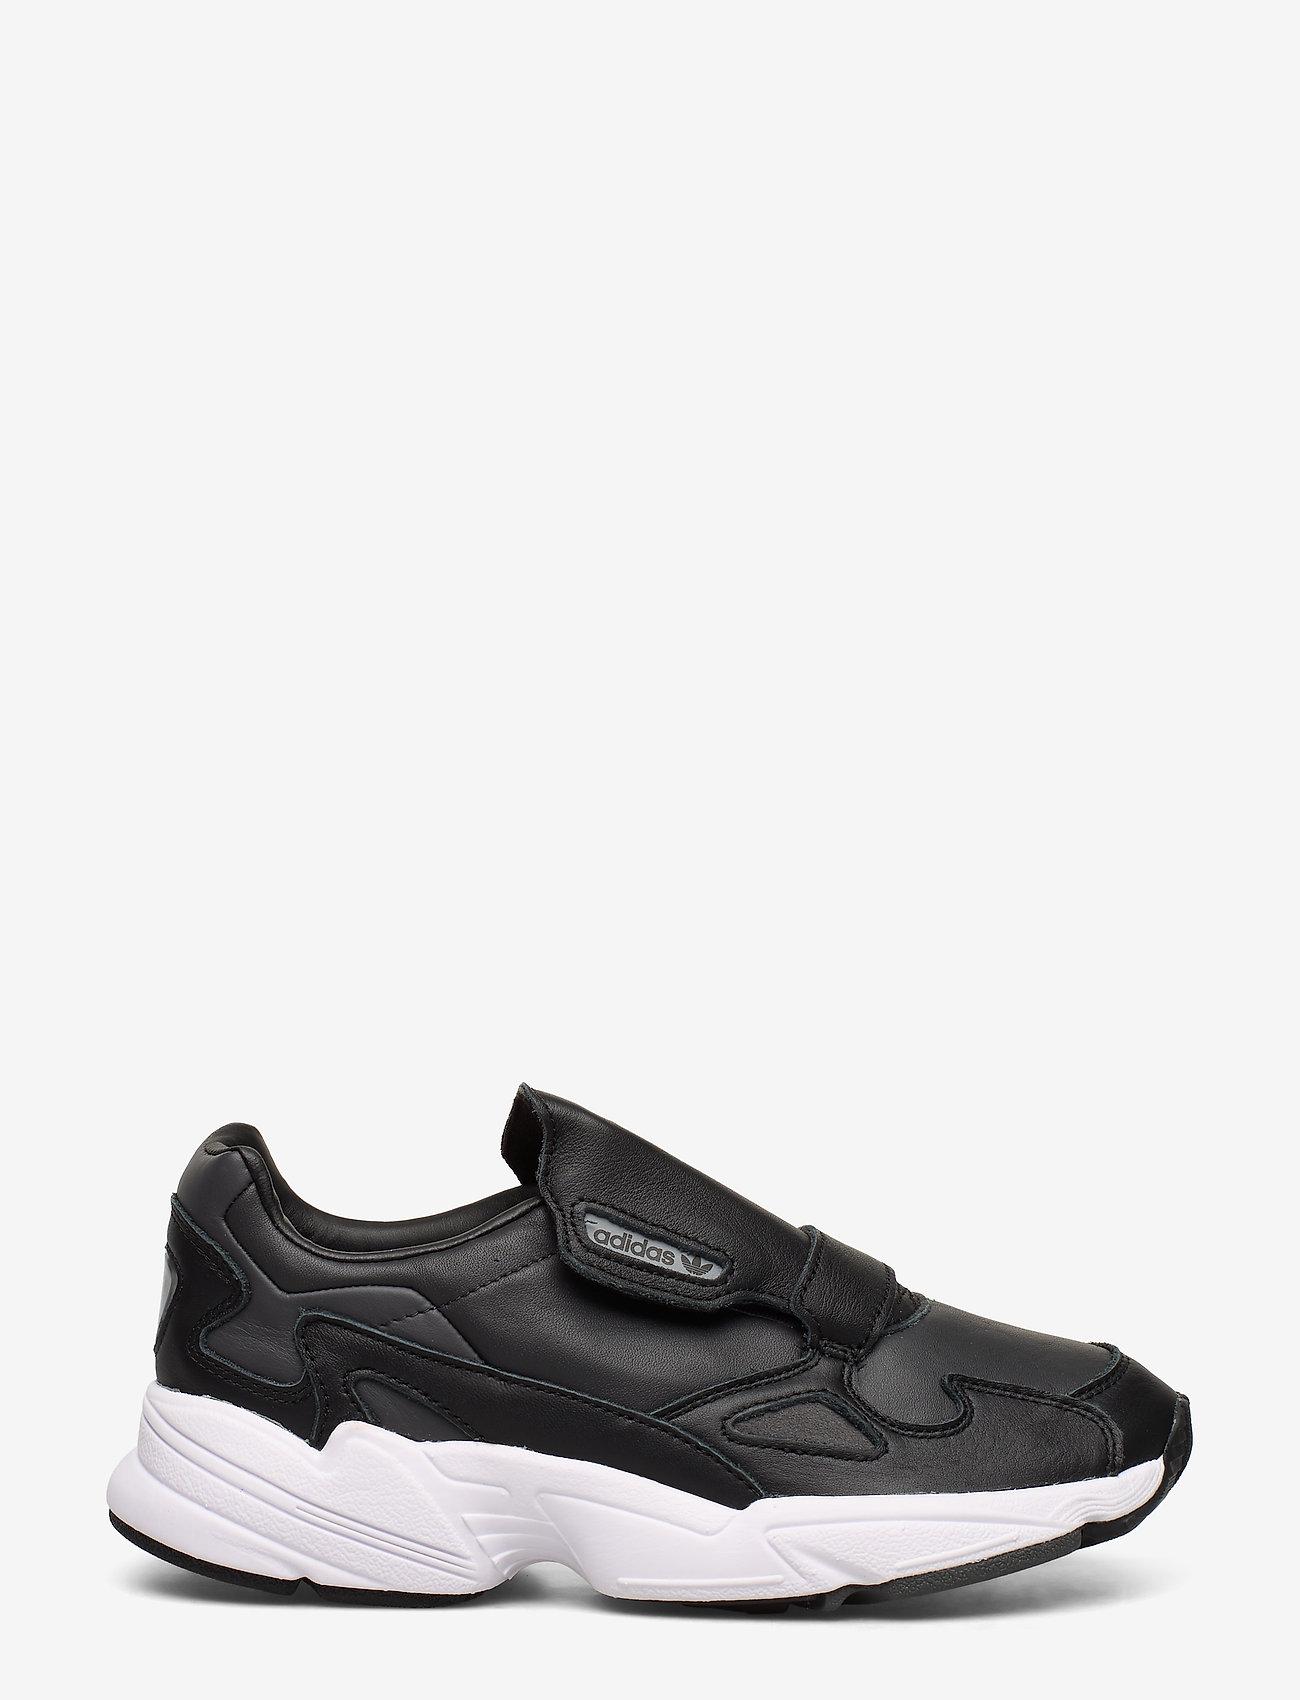 Adidas Originals Falcon Rx W - Baskets